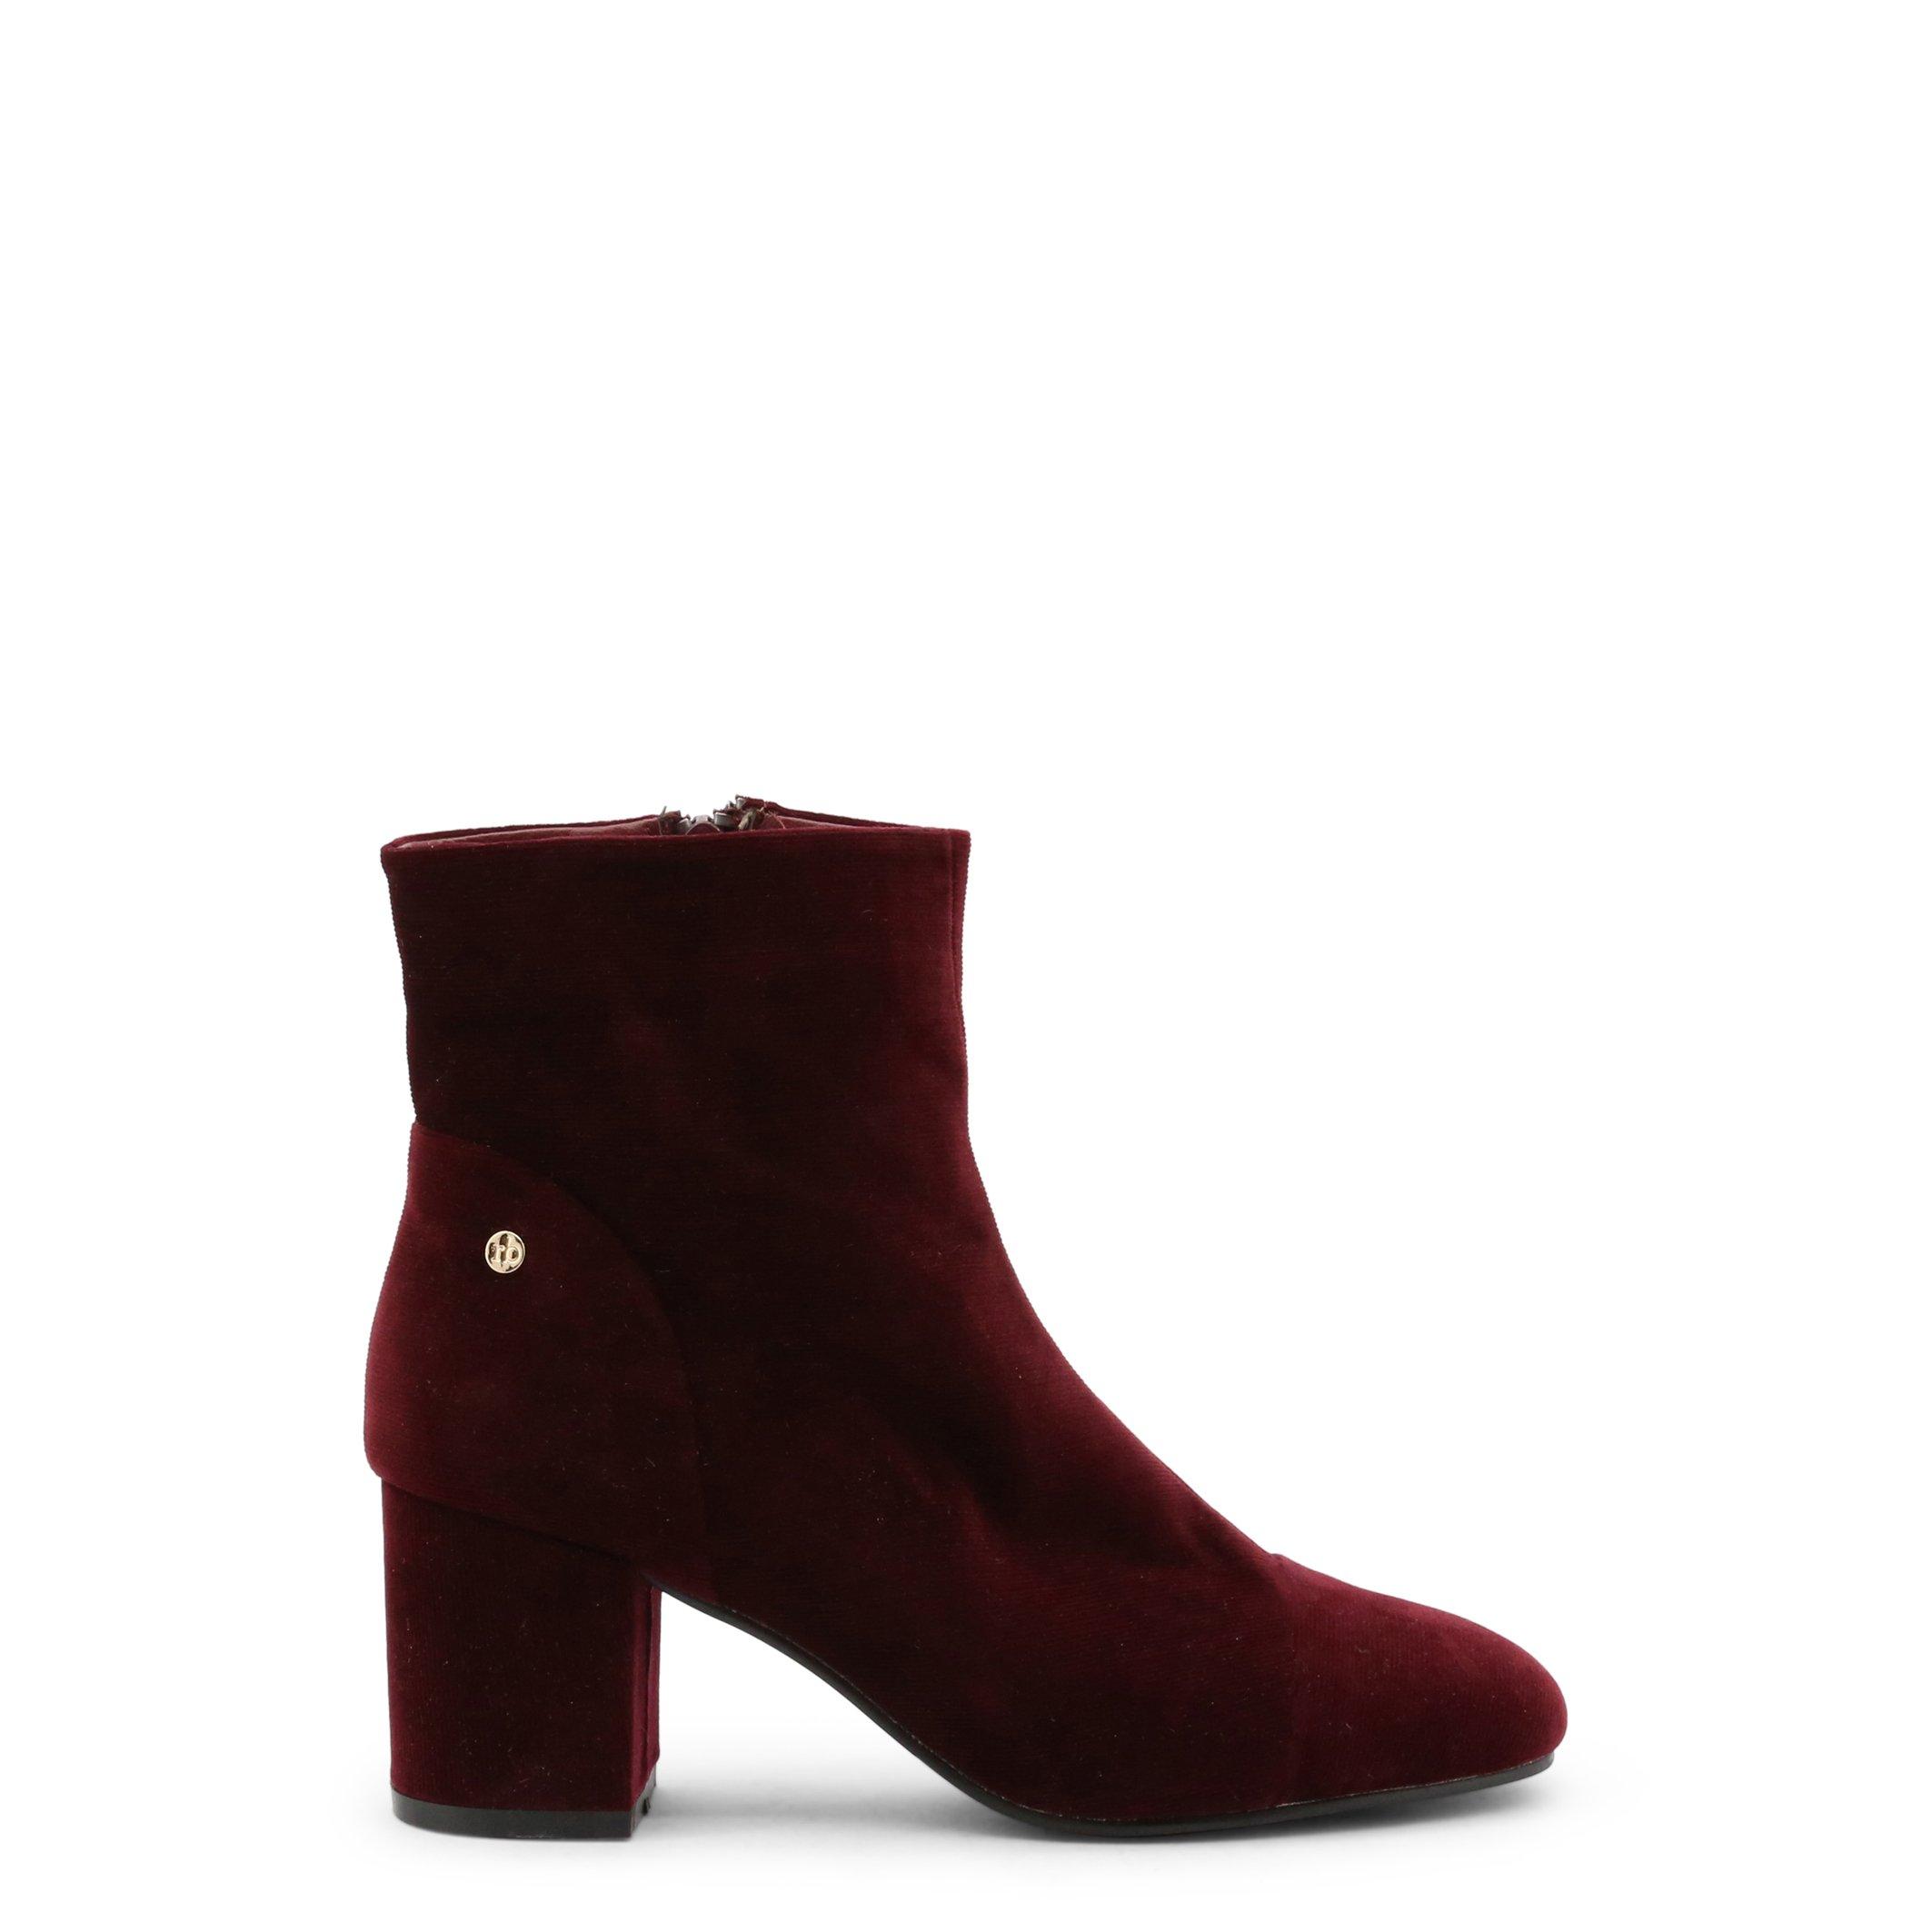 Roccobarocco Women's Ankle Boot Black RBSC1N201STD - red EU 37